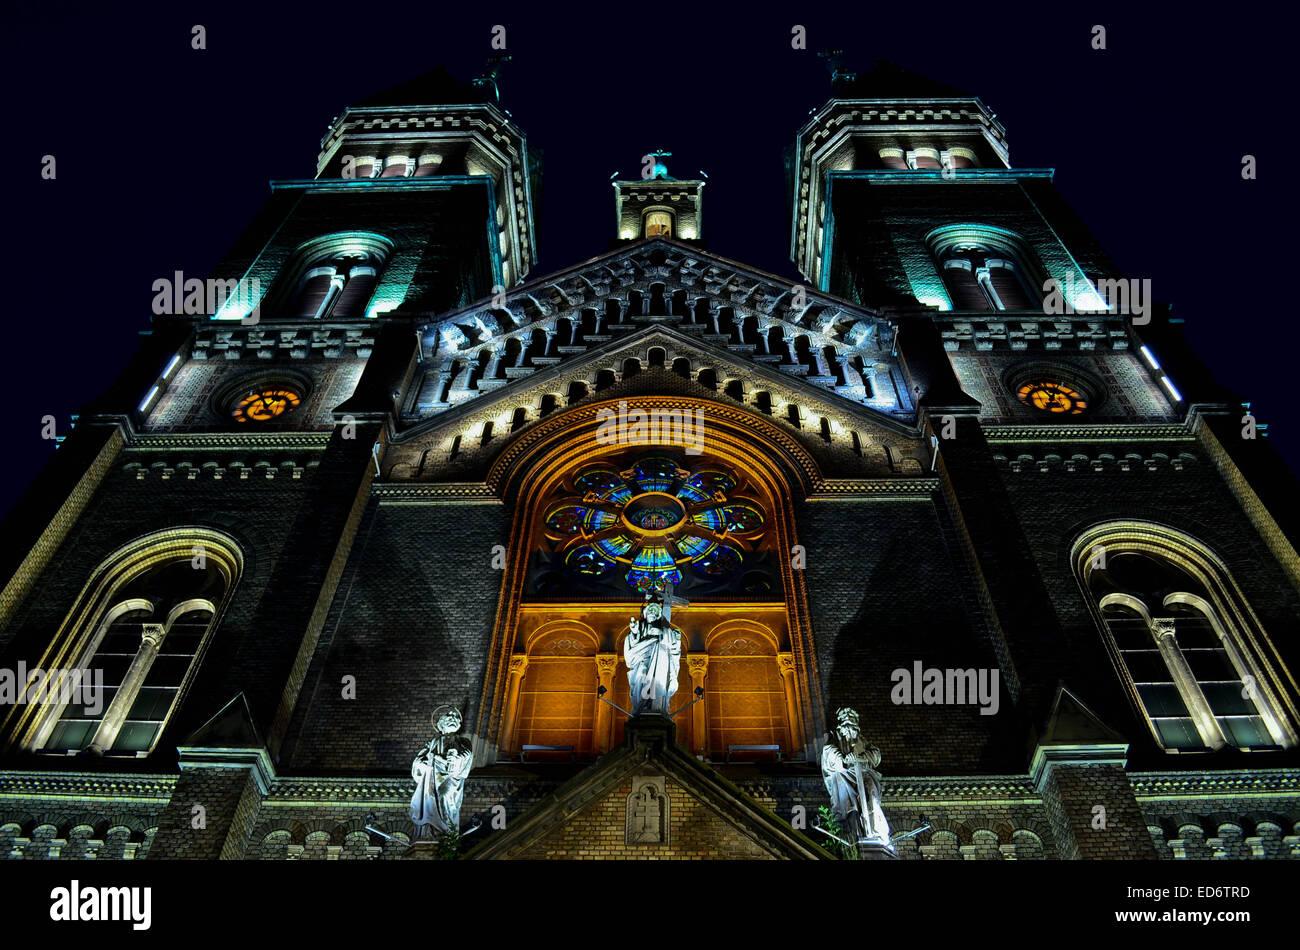 Millennium Church by night in Timisoara, Romania Stock Photo